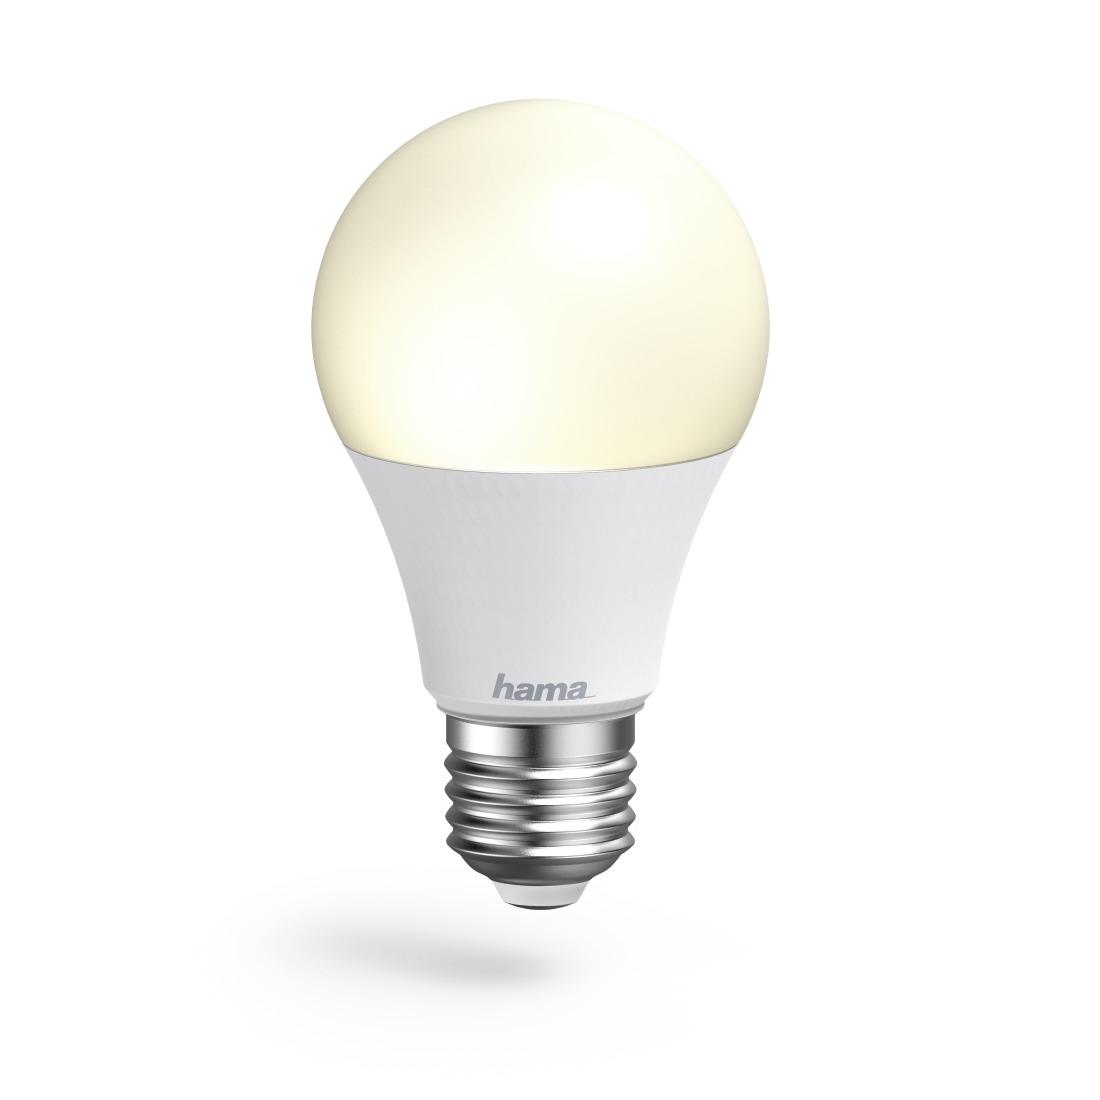 Hama Wifi-ledlamp, E27, 10W, , dimbaar Smartverlichting Wit